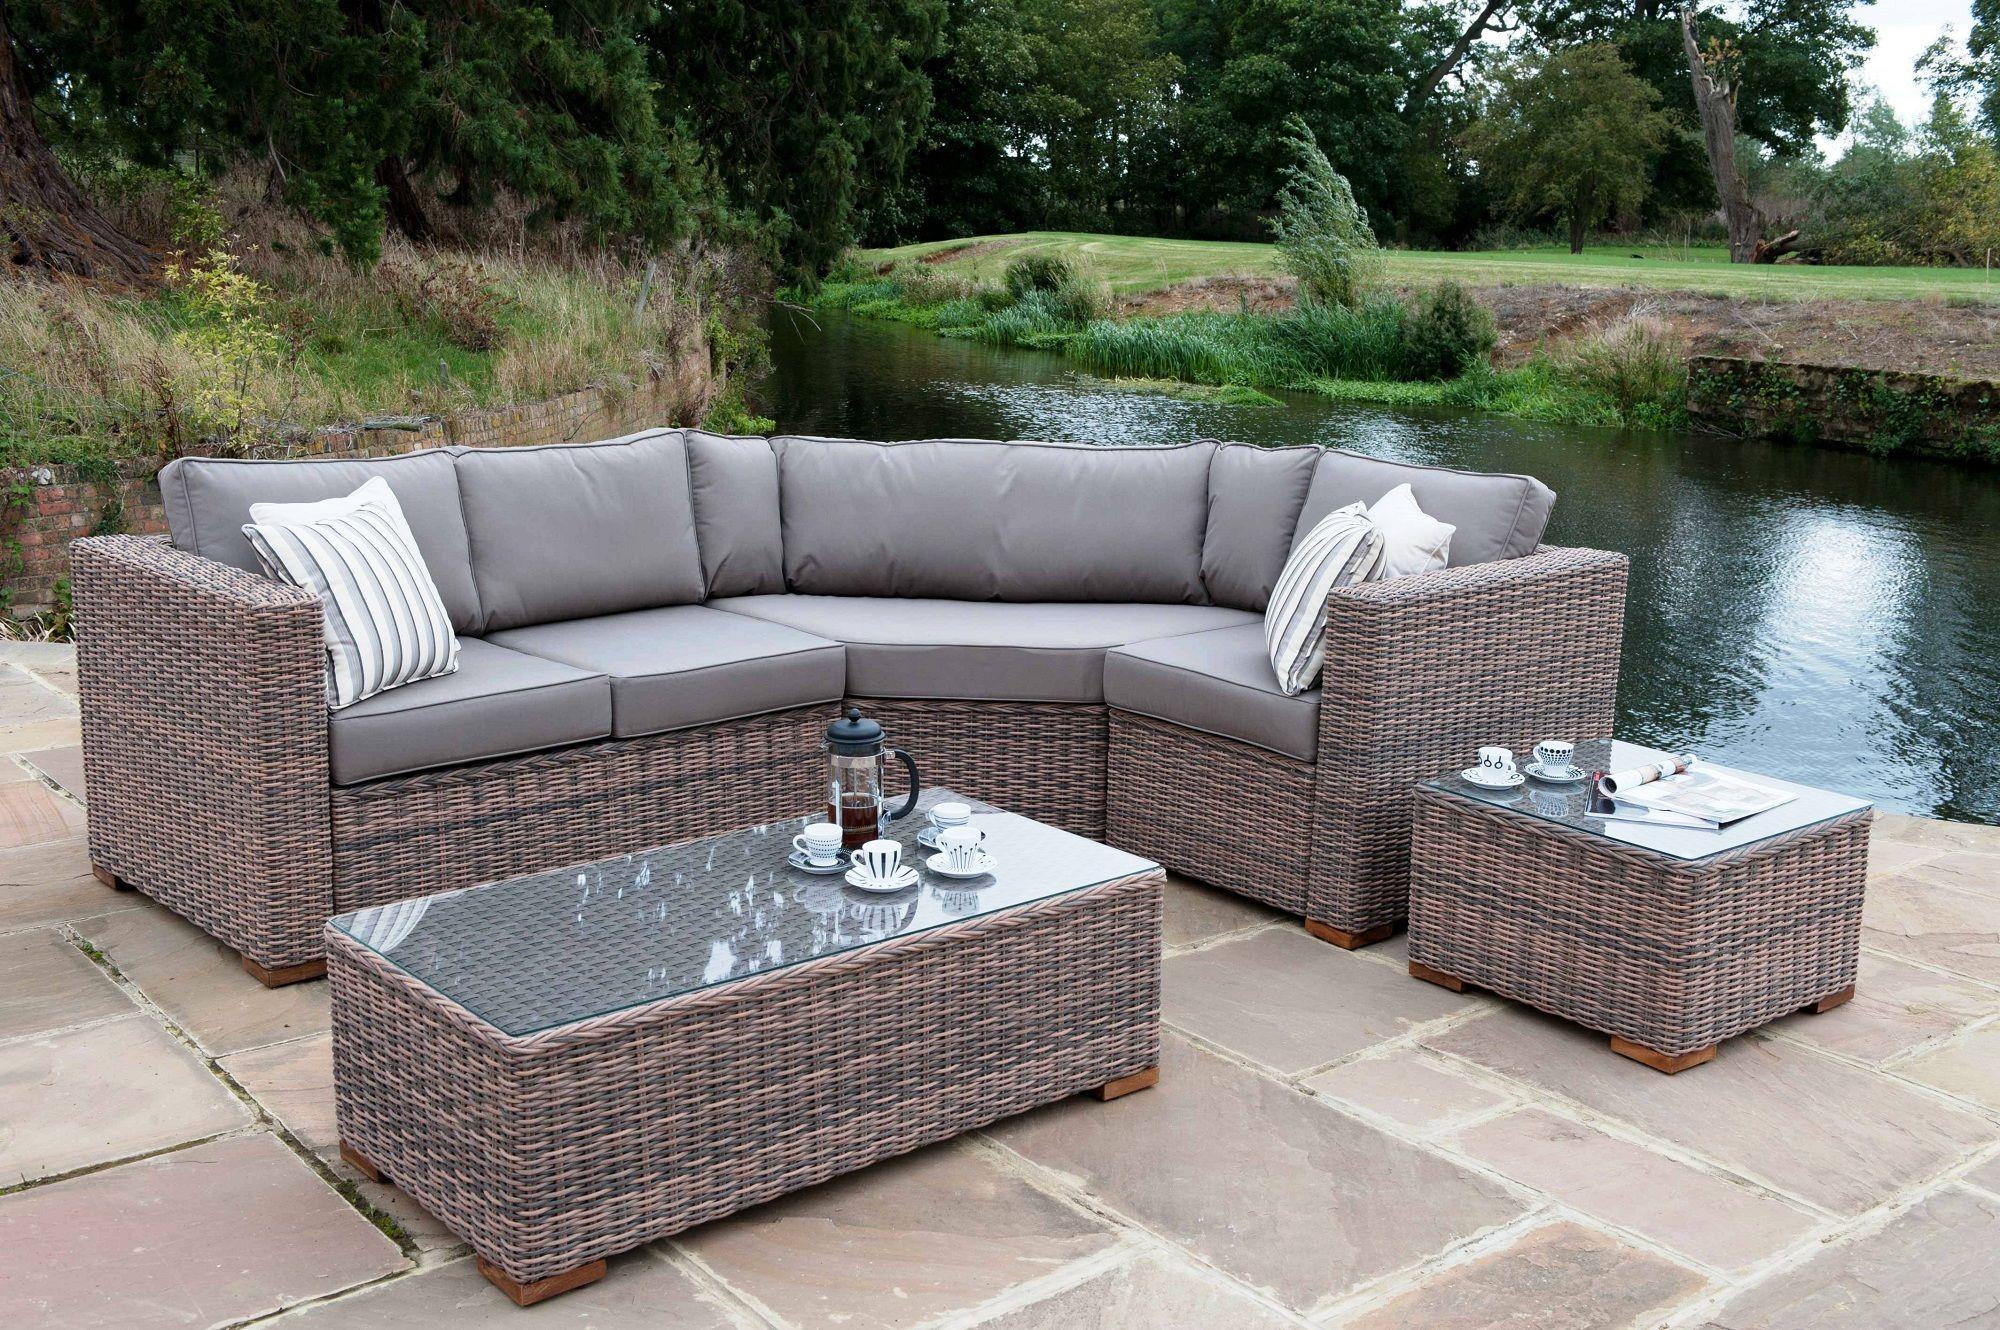 Image result for outdoor rattan furniture hotel uk